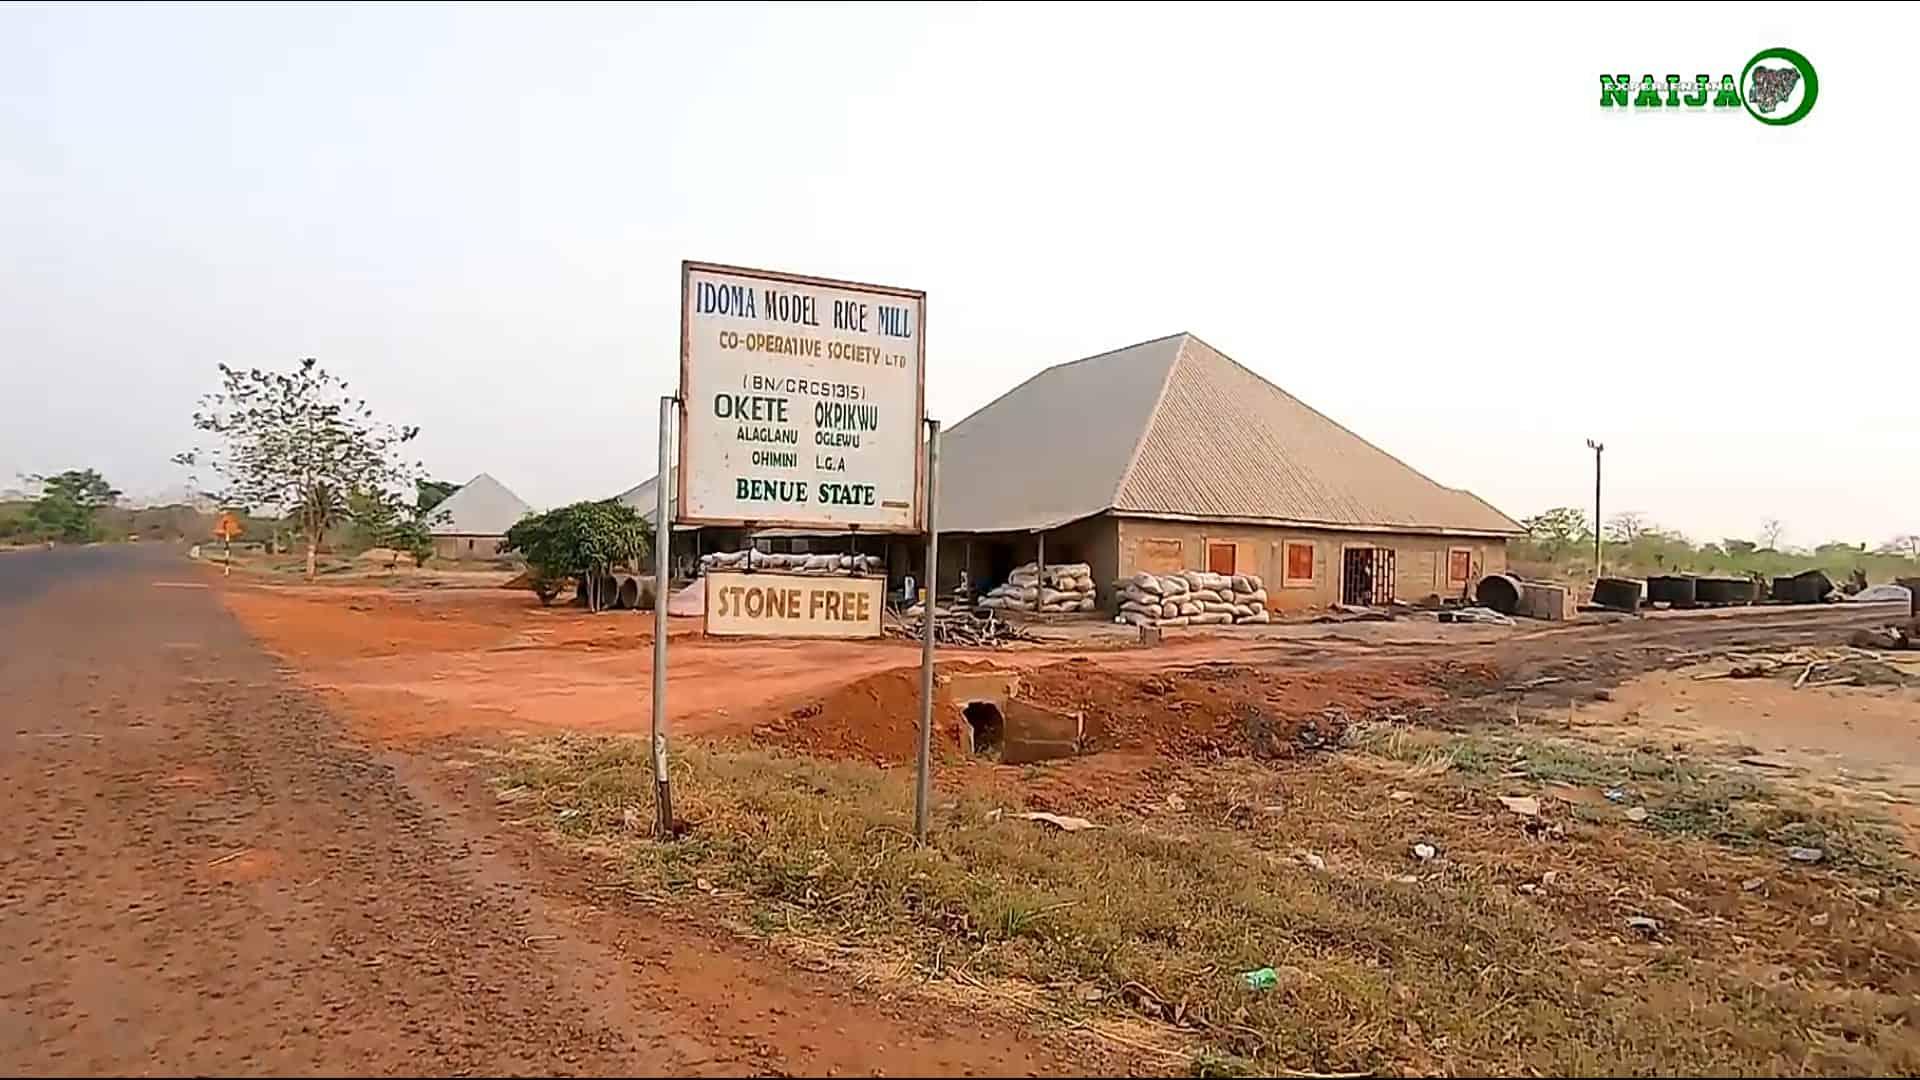 The Idoma Model Rice Mill, Benue State, Nigeria